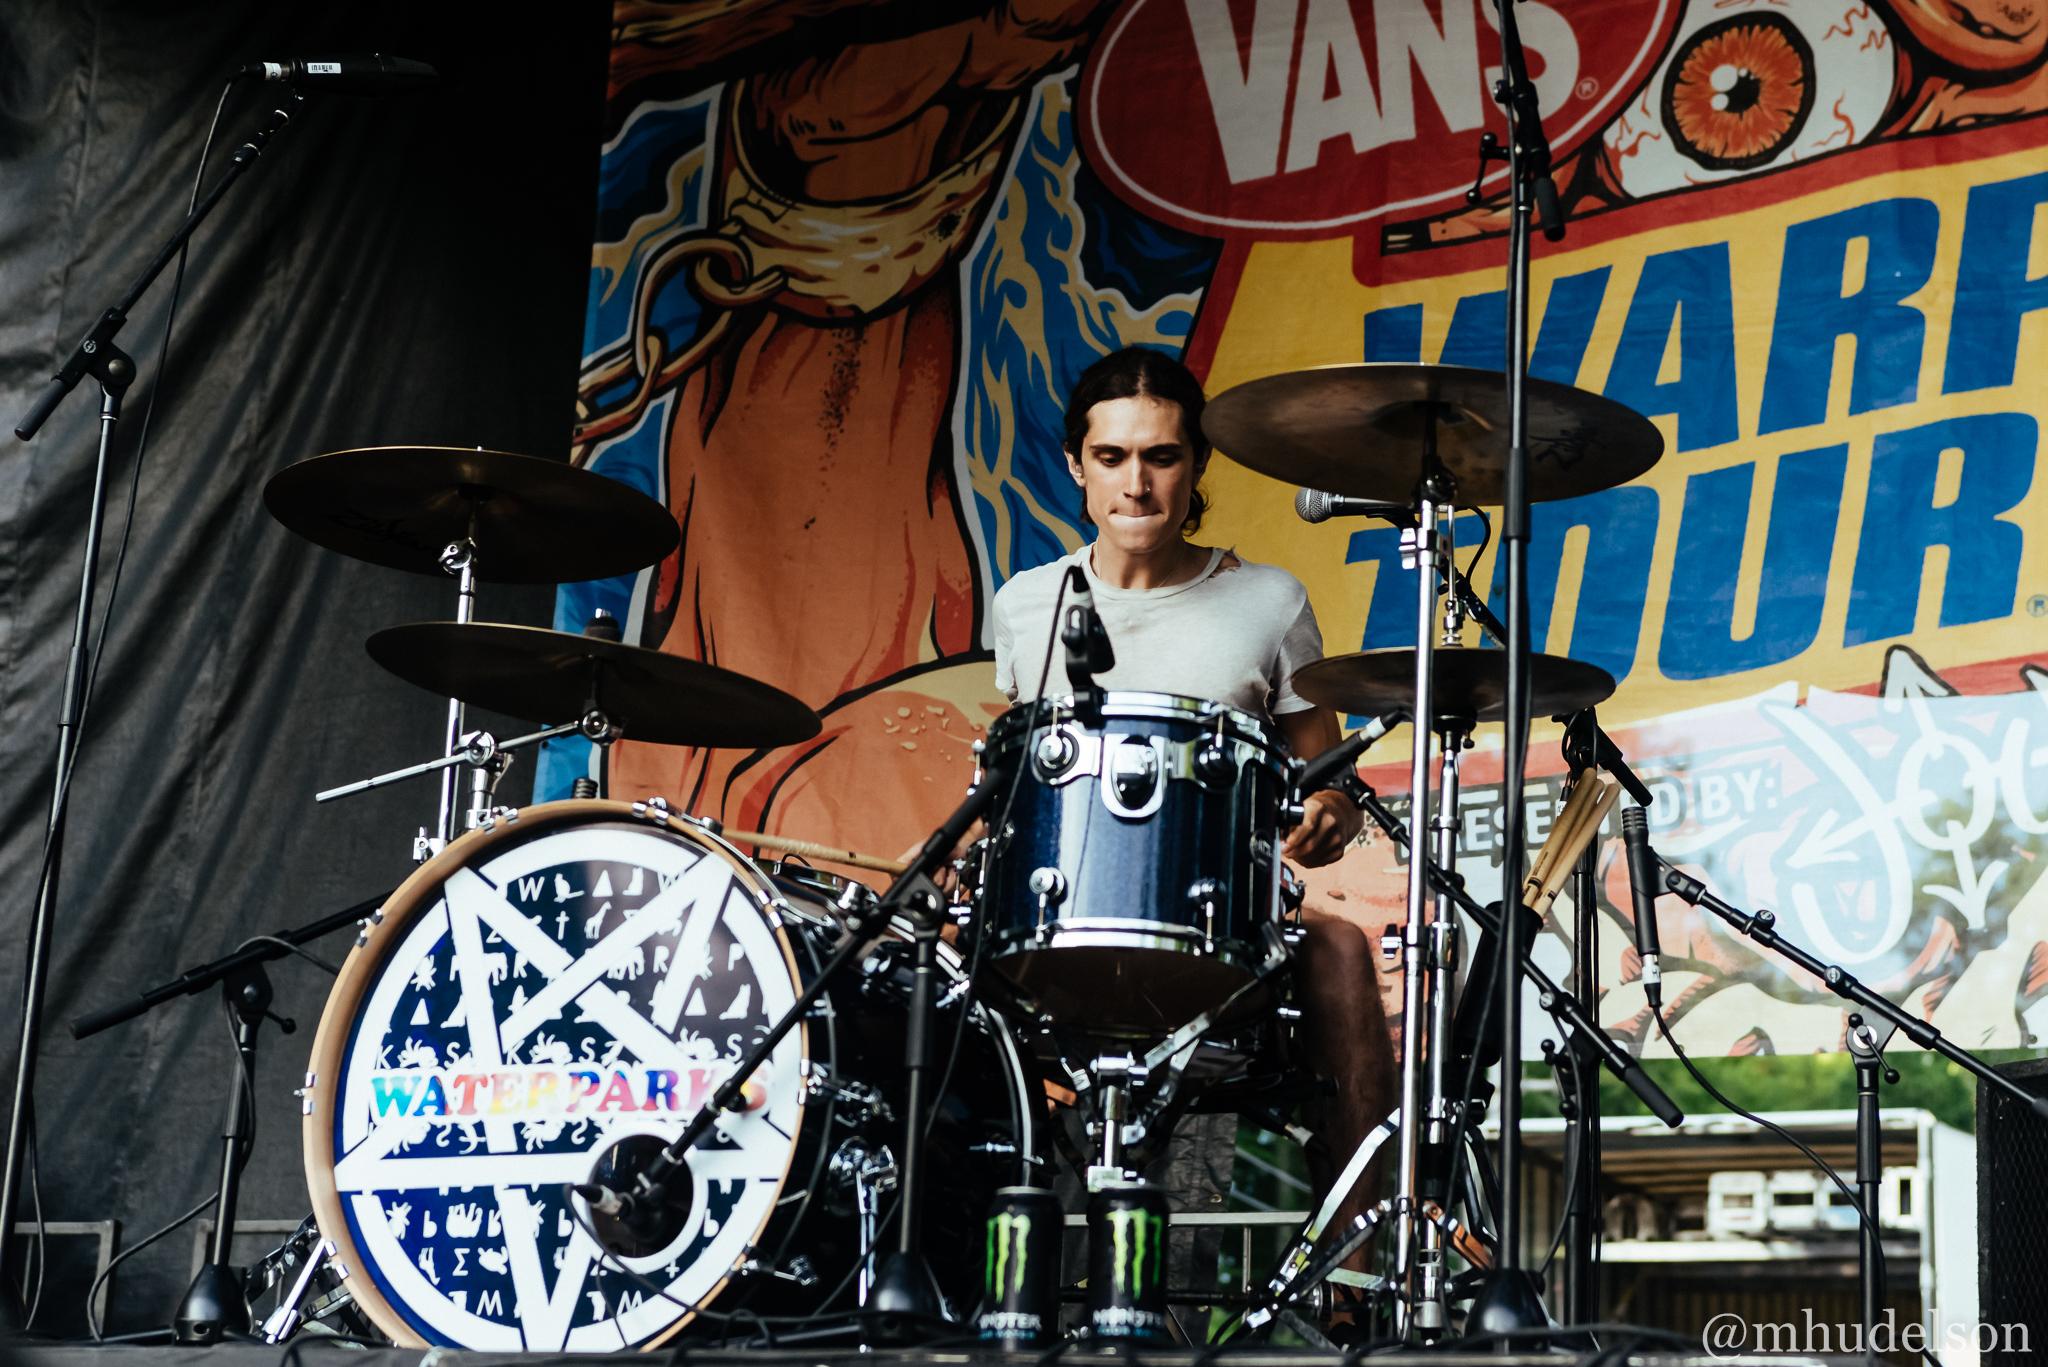 Waterparks / 7/11/16 / Vans Warped Tour / Scranton, PA